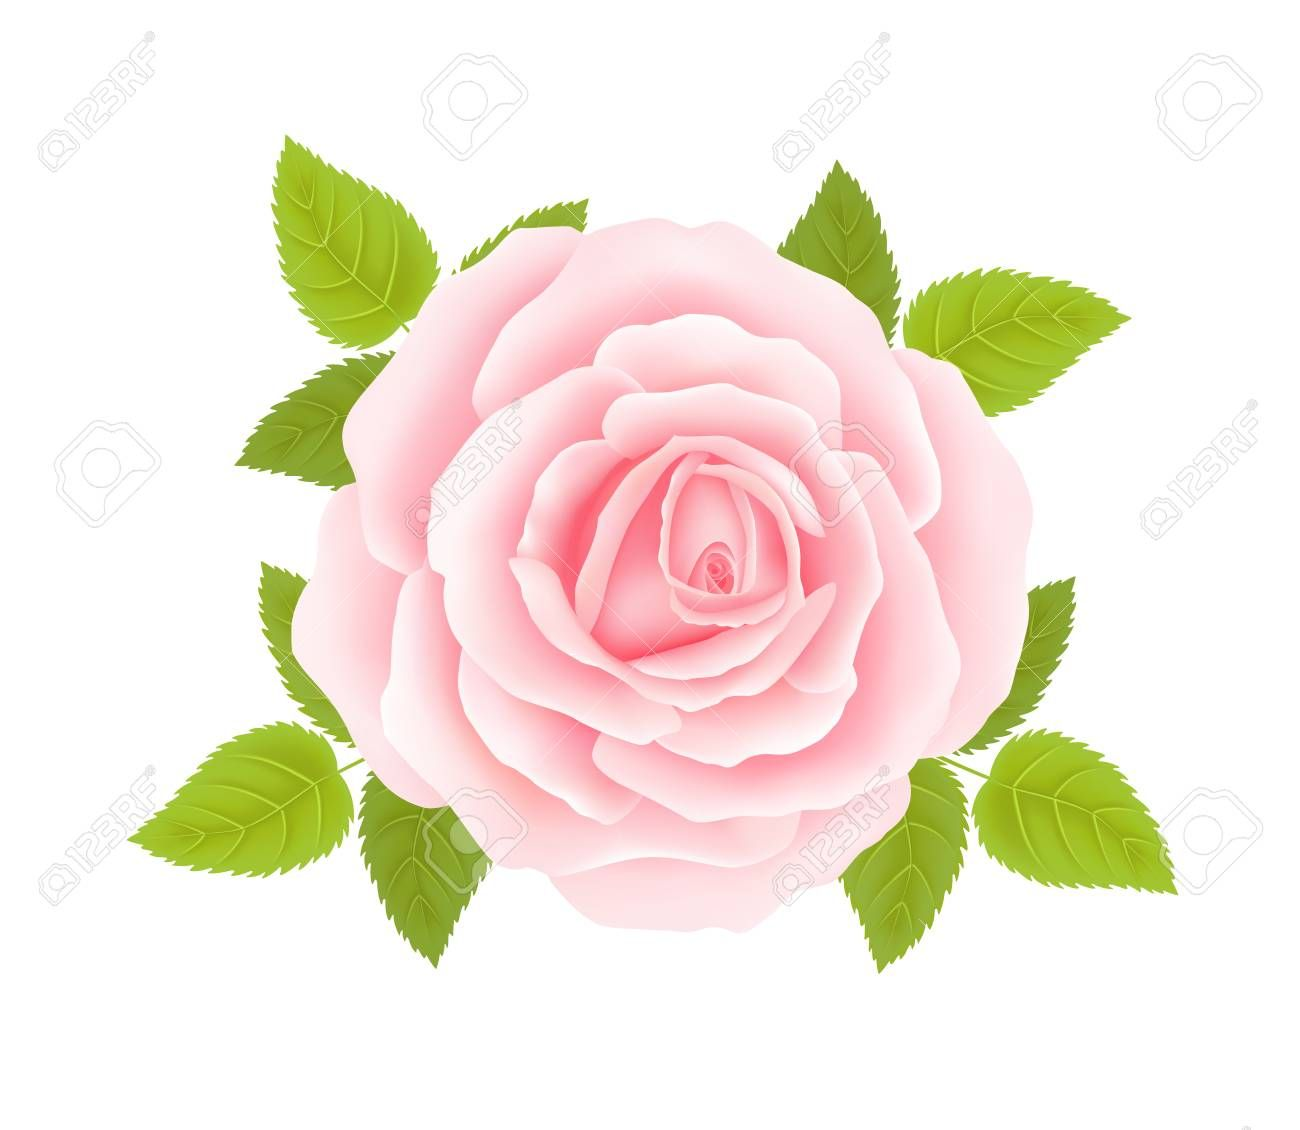 Pink Rose Flower Isolated On White Background Vector Illustration